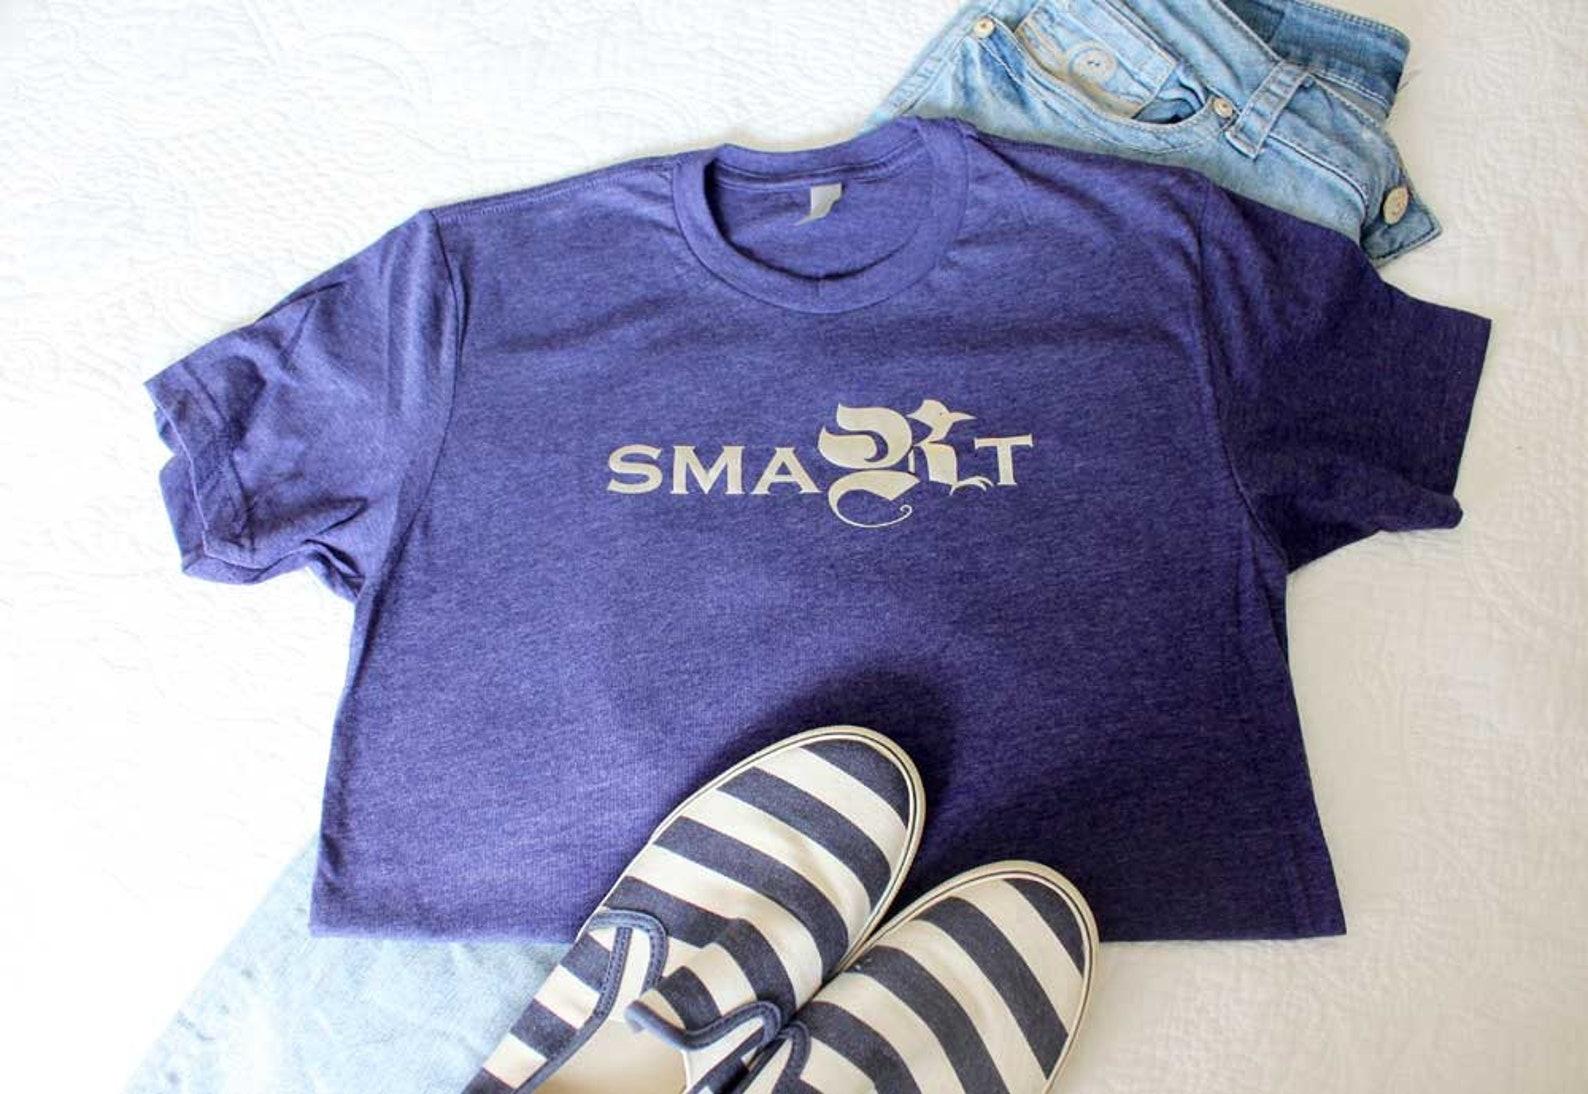 Smart Ravenclaw t-shirt